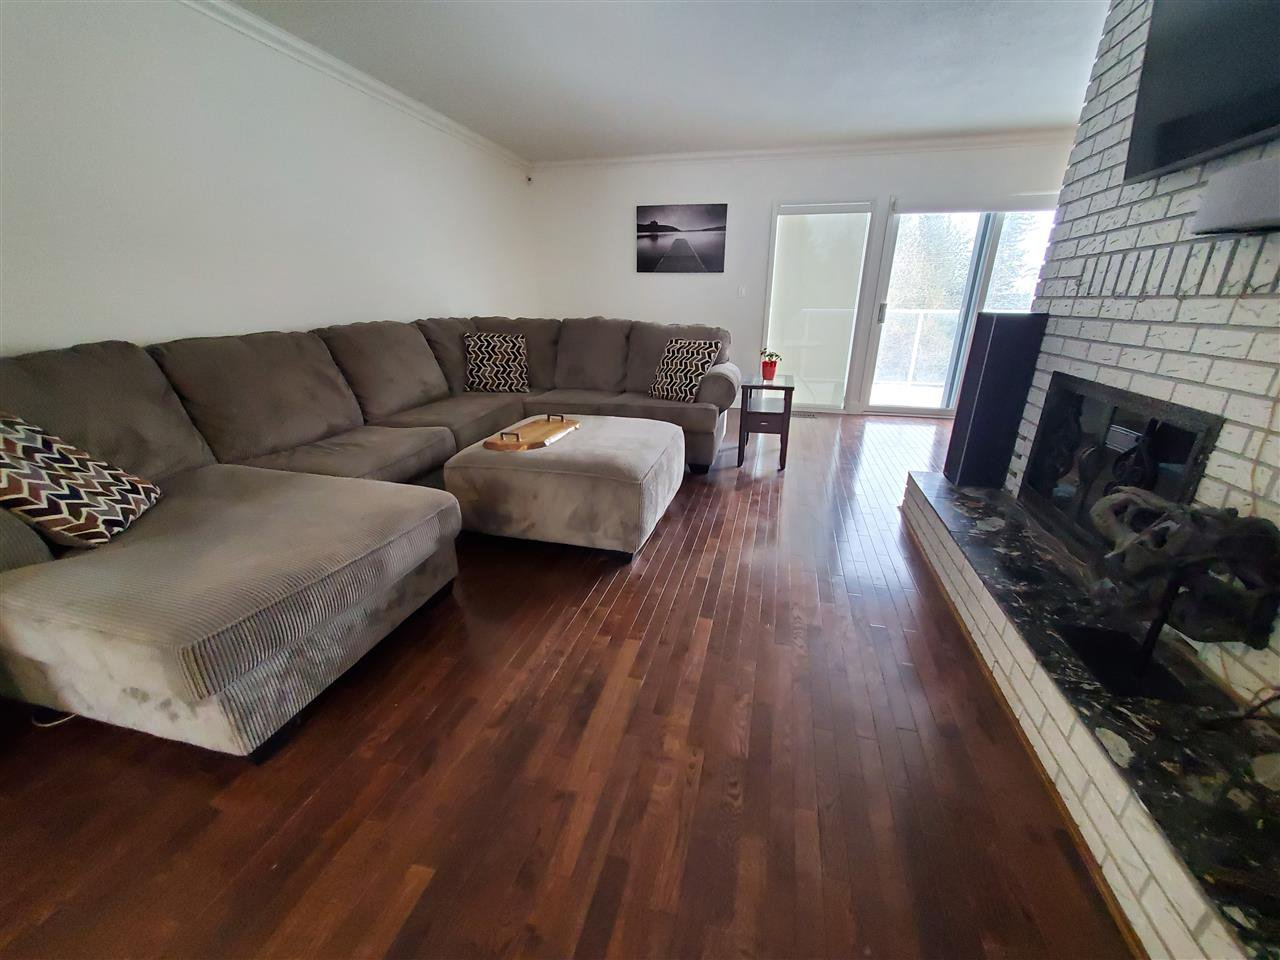 Photo 8: Photos: 114 WESTRIDGE Drive in Williams Lake: Williams Lake - City House for sale (Williams Lake (Zone 27))  : MLS®# R2436837